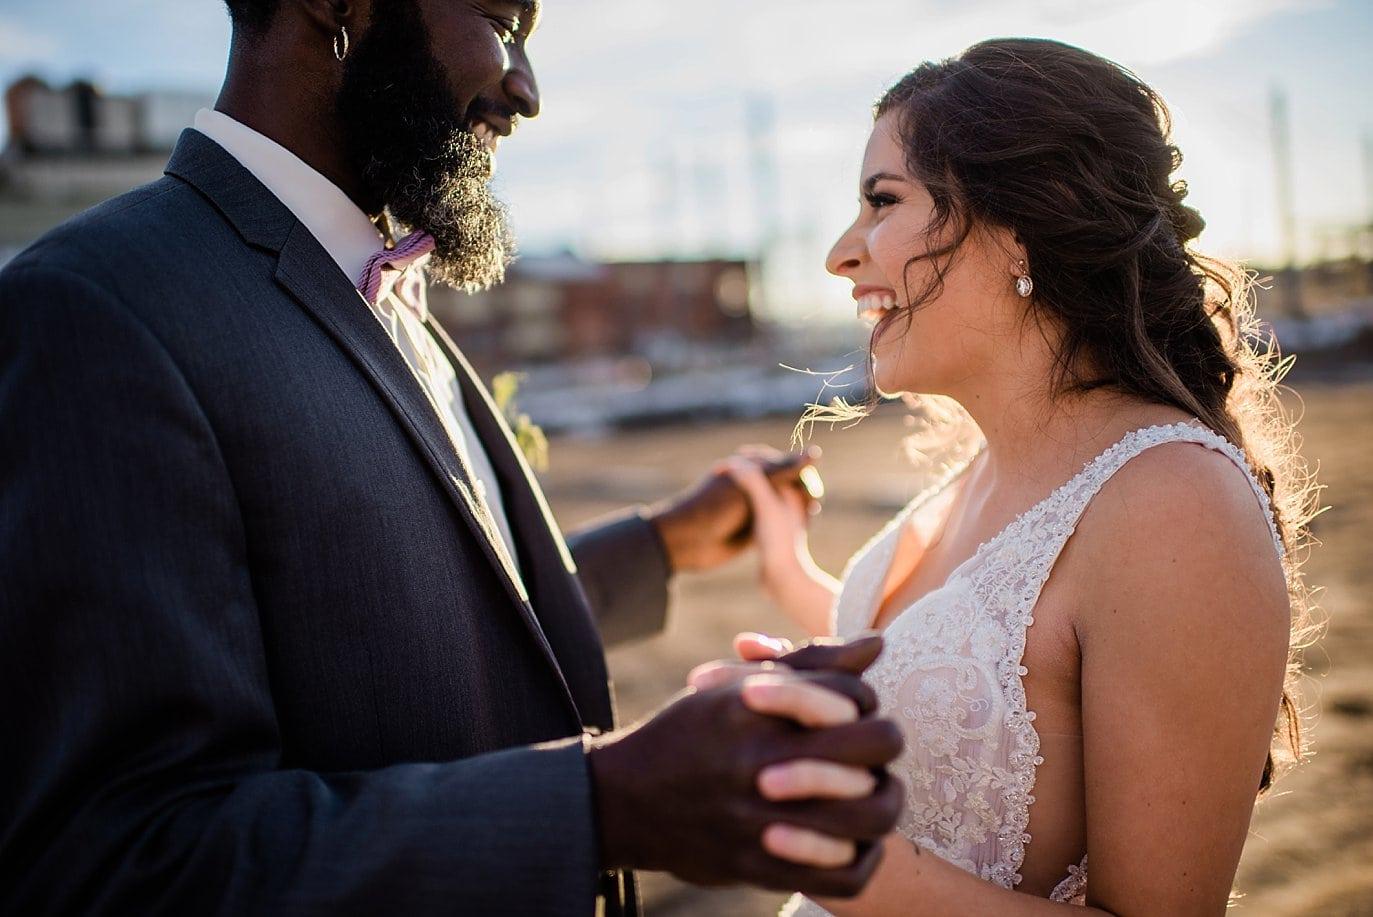 bride and groom sunset portrait at Shyft Denver wedding by Aurora wedding photographer Jennie Crate photographer